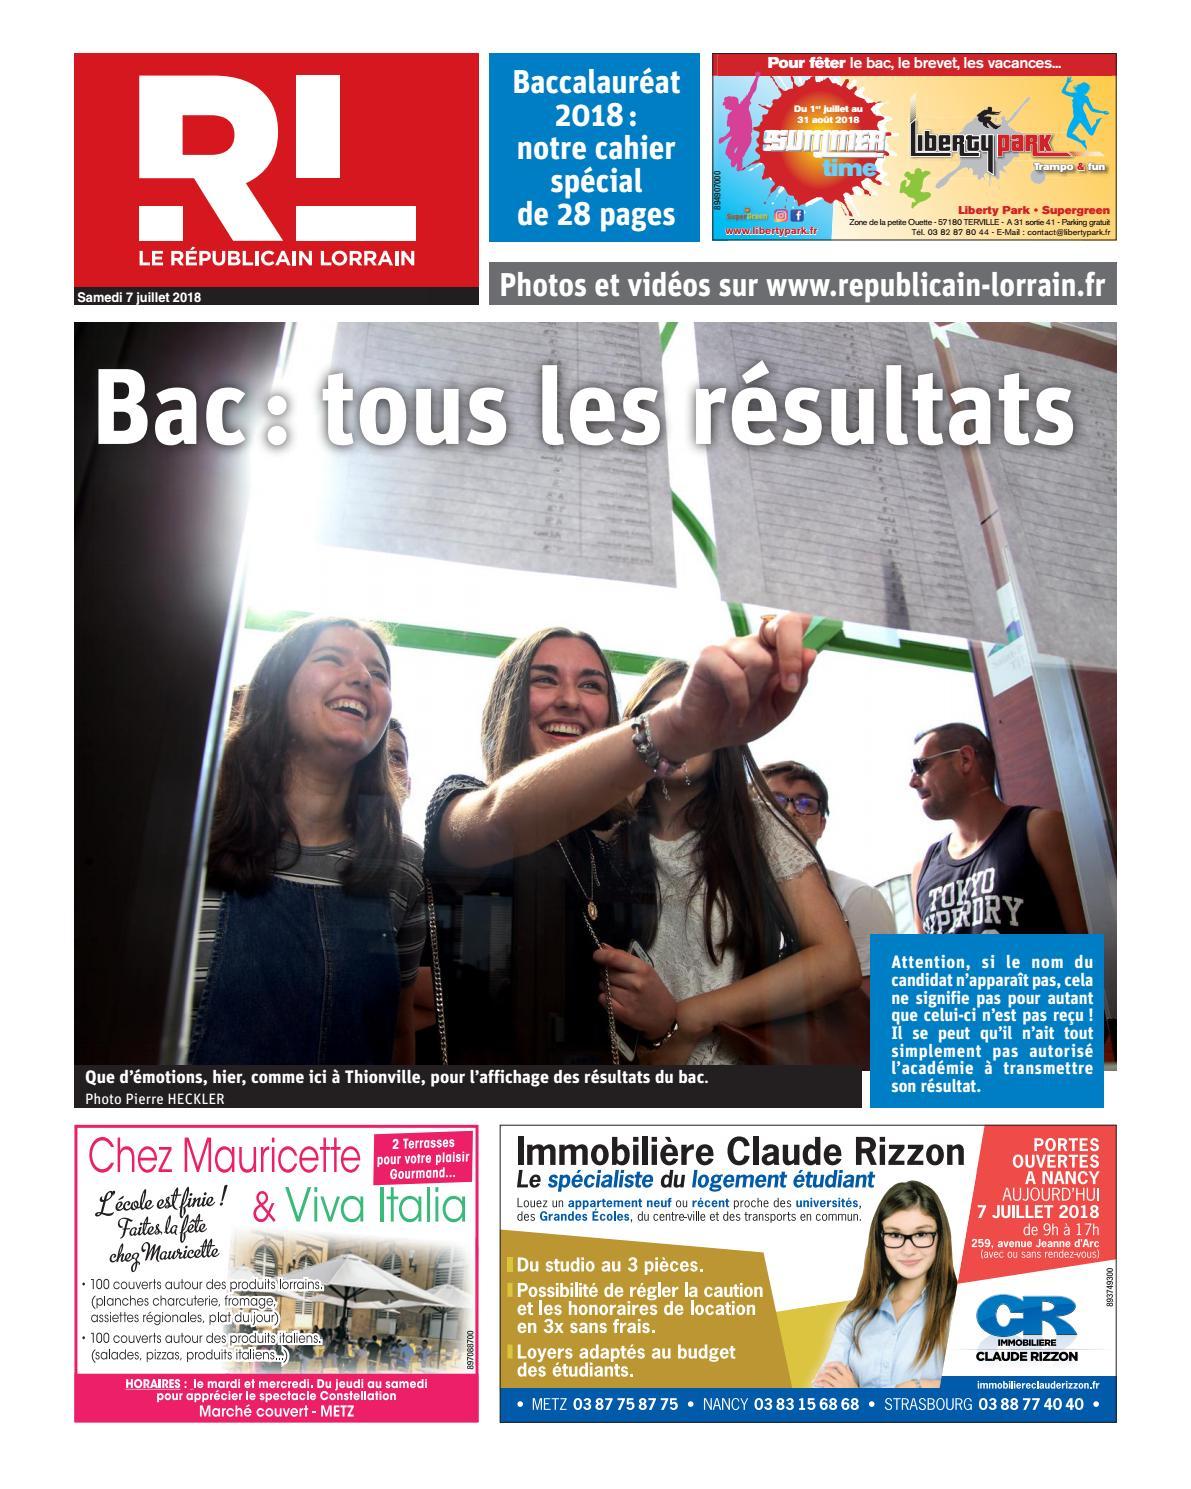 Bac Lorrain Issuu Résultat 2018 By Républicain tdCshQr